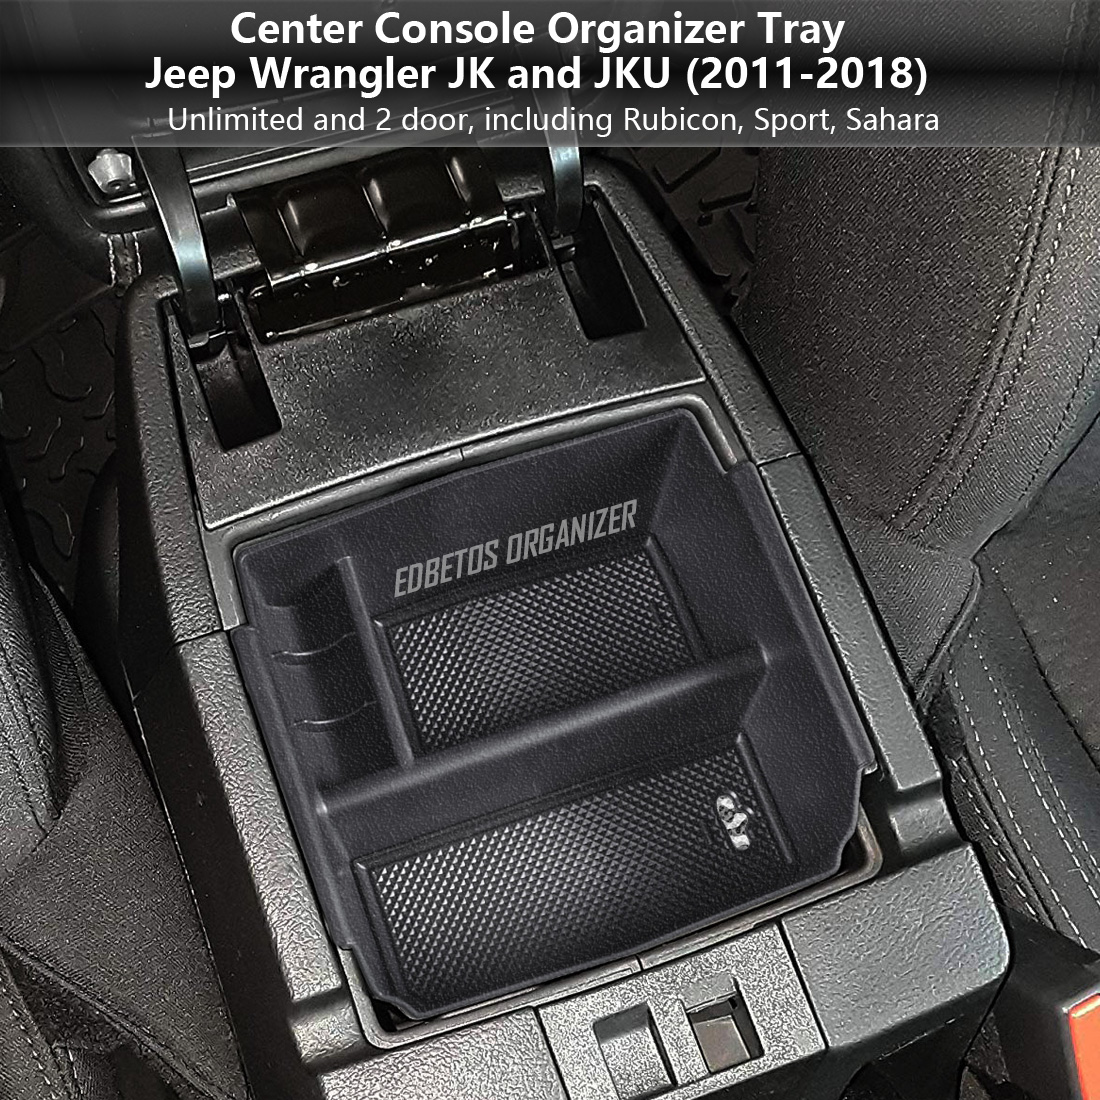 Jeyaic Dashboard Organizer Center Console Insert Storage Tray for 2011-2018 Jeep Wrangler JK JKU Black